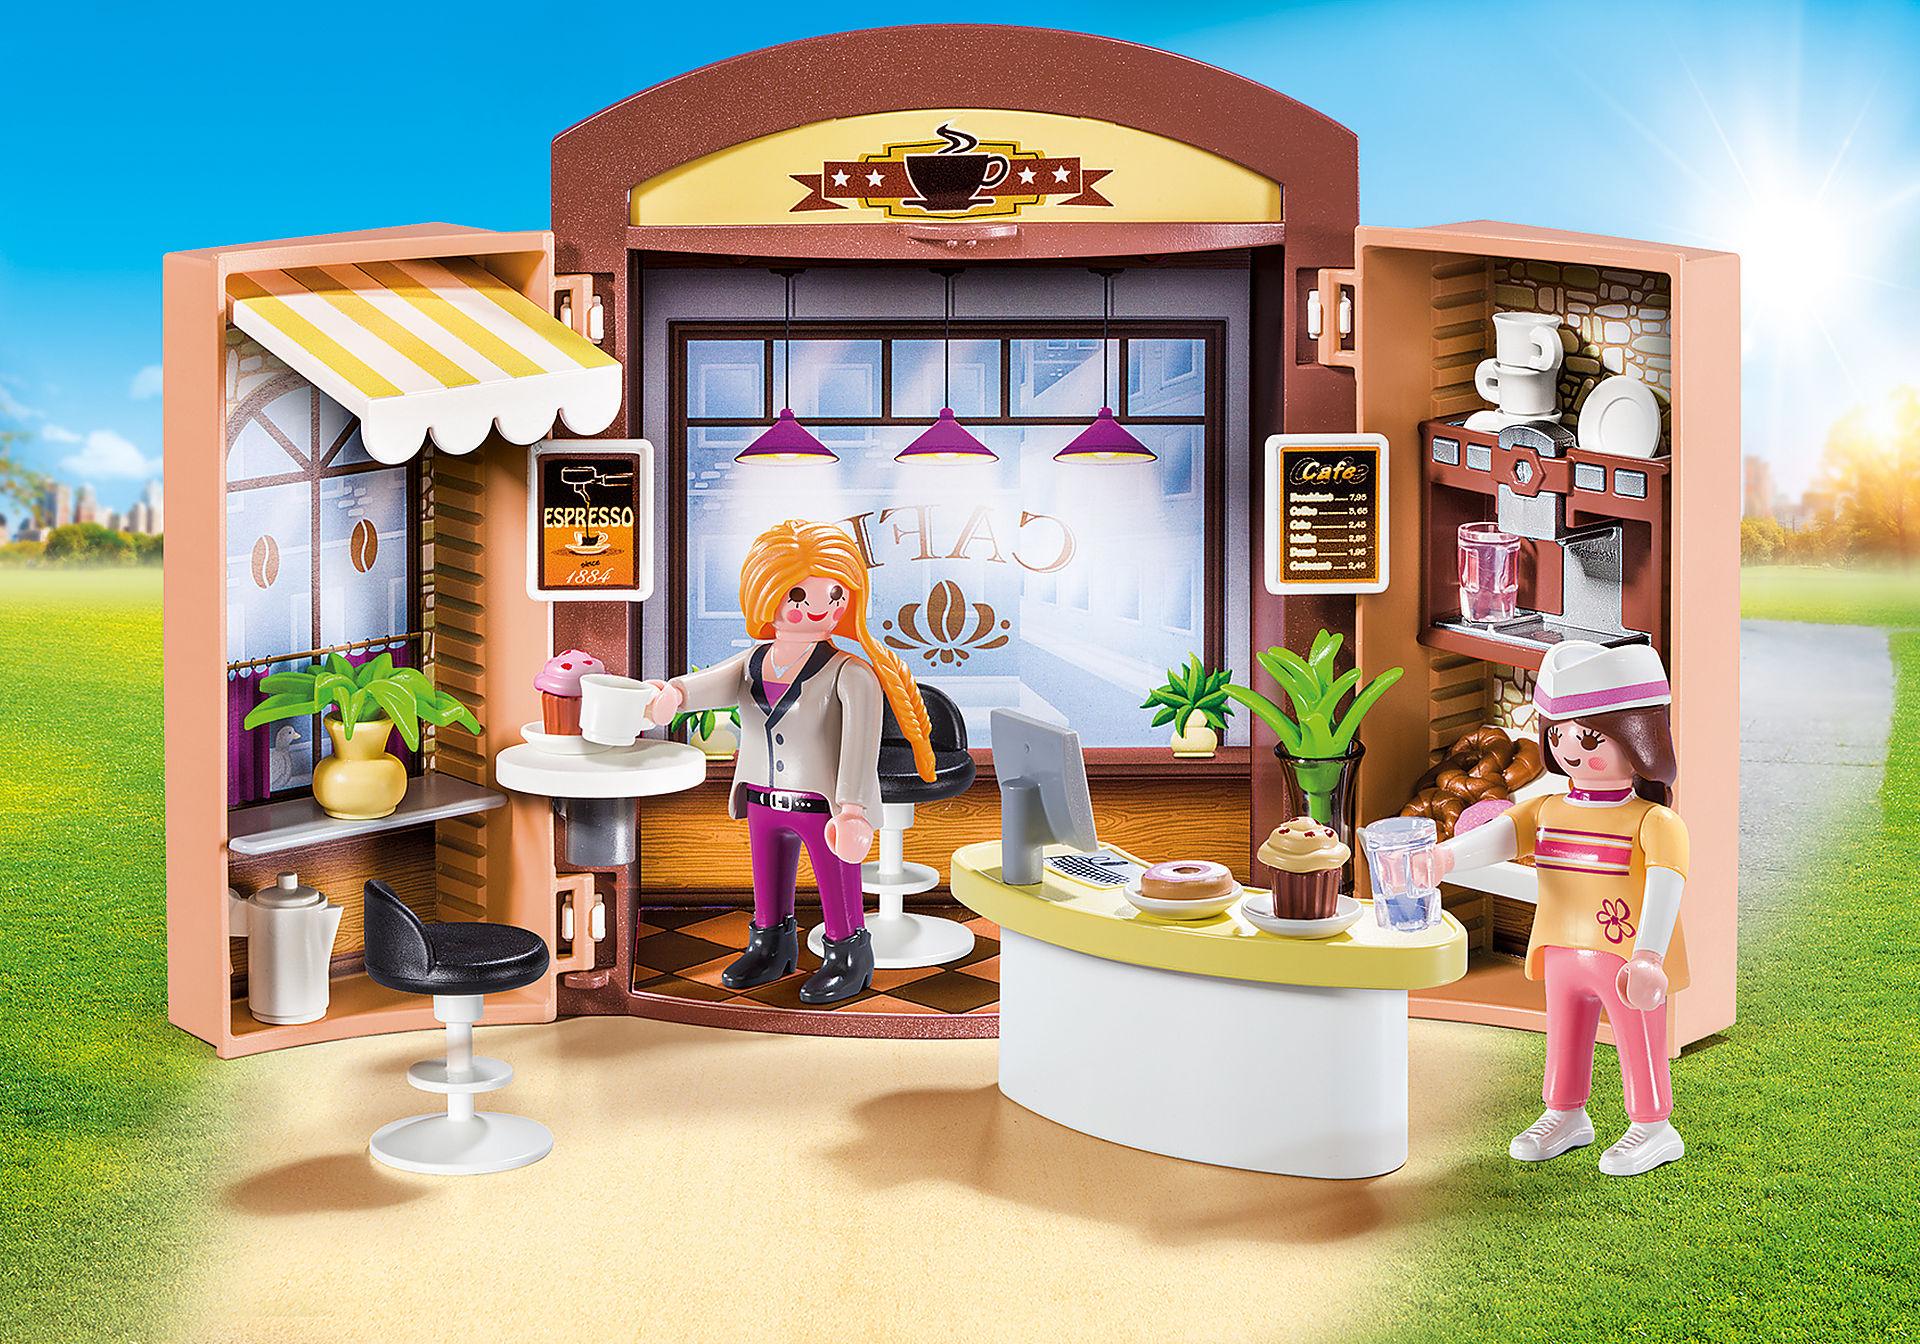 http://media.playmobil.com/i/playmobil/9109_product_detail/Coffee Shop Play Box